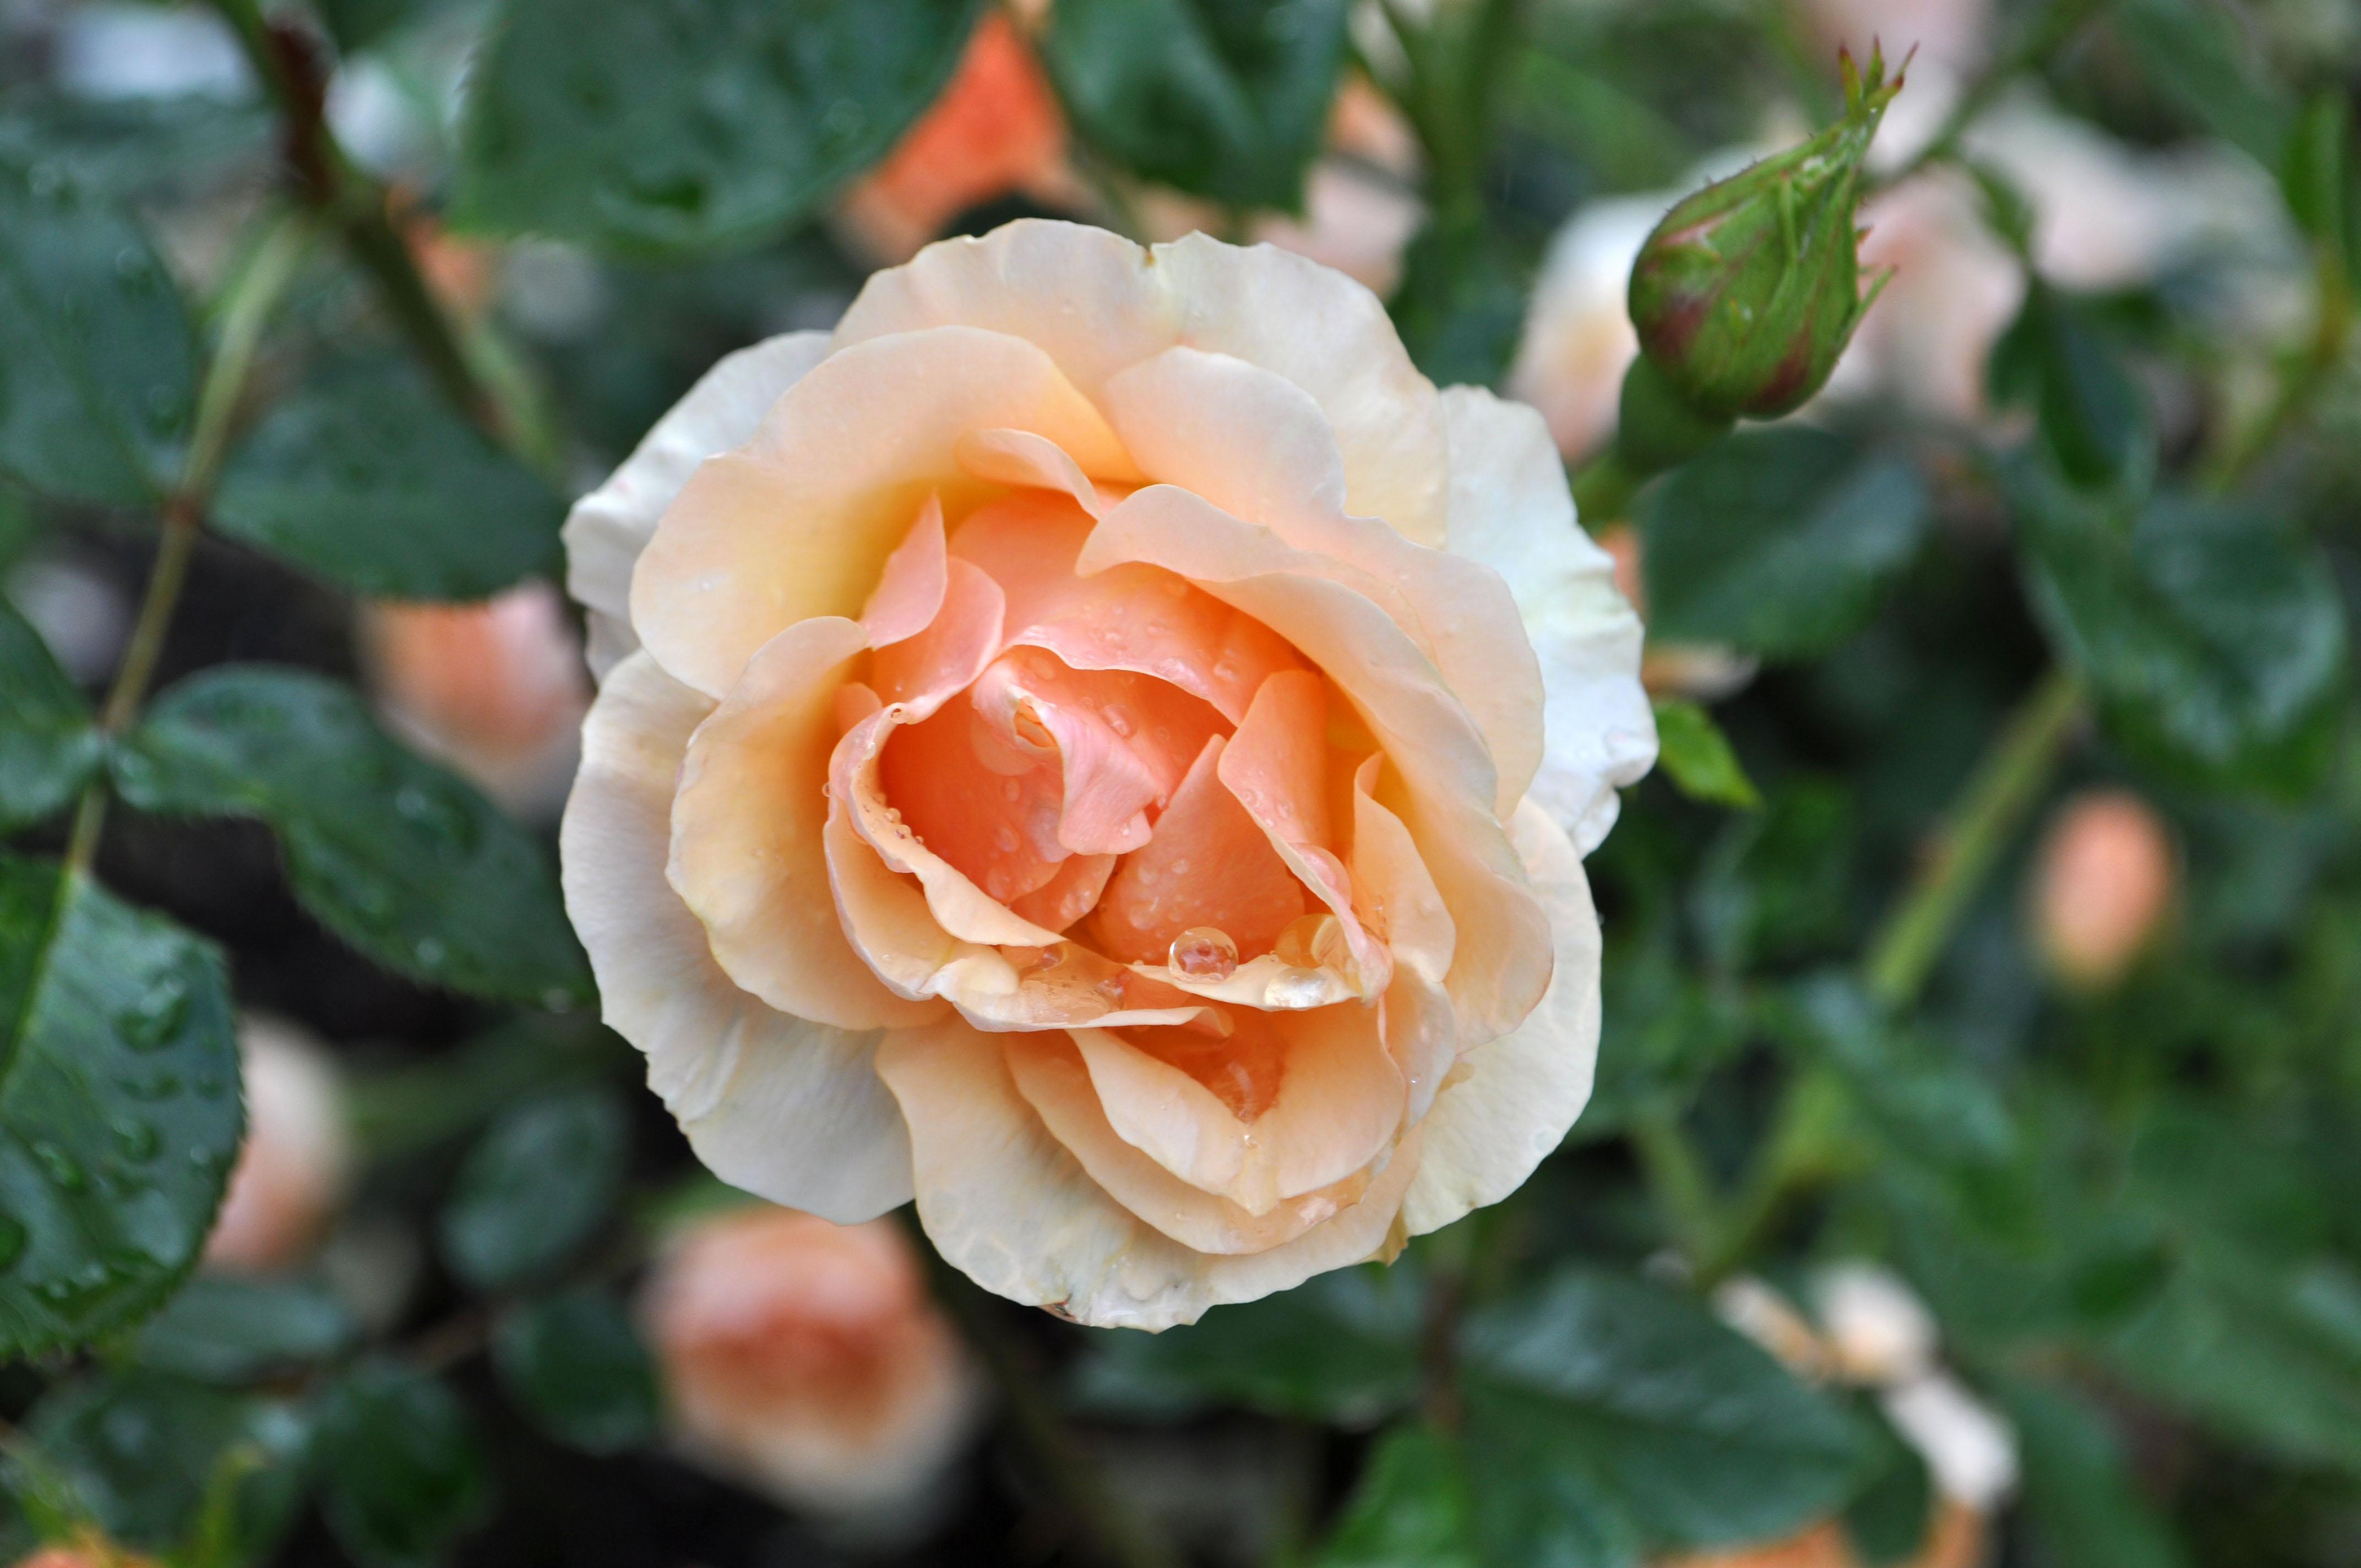 Stunning roses